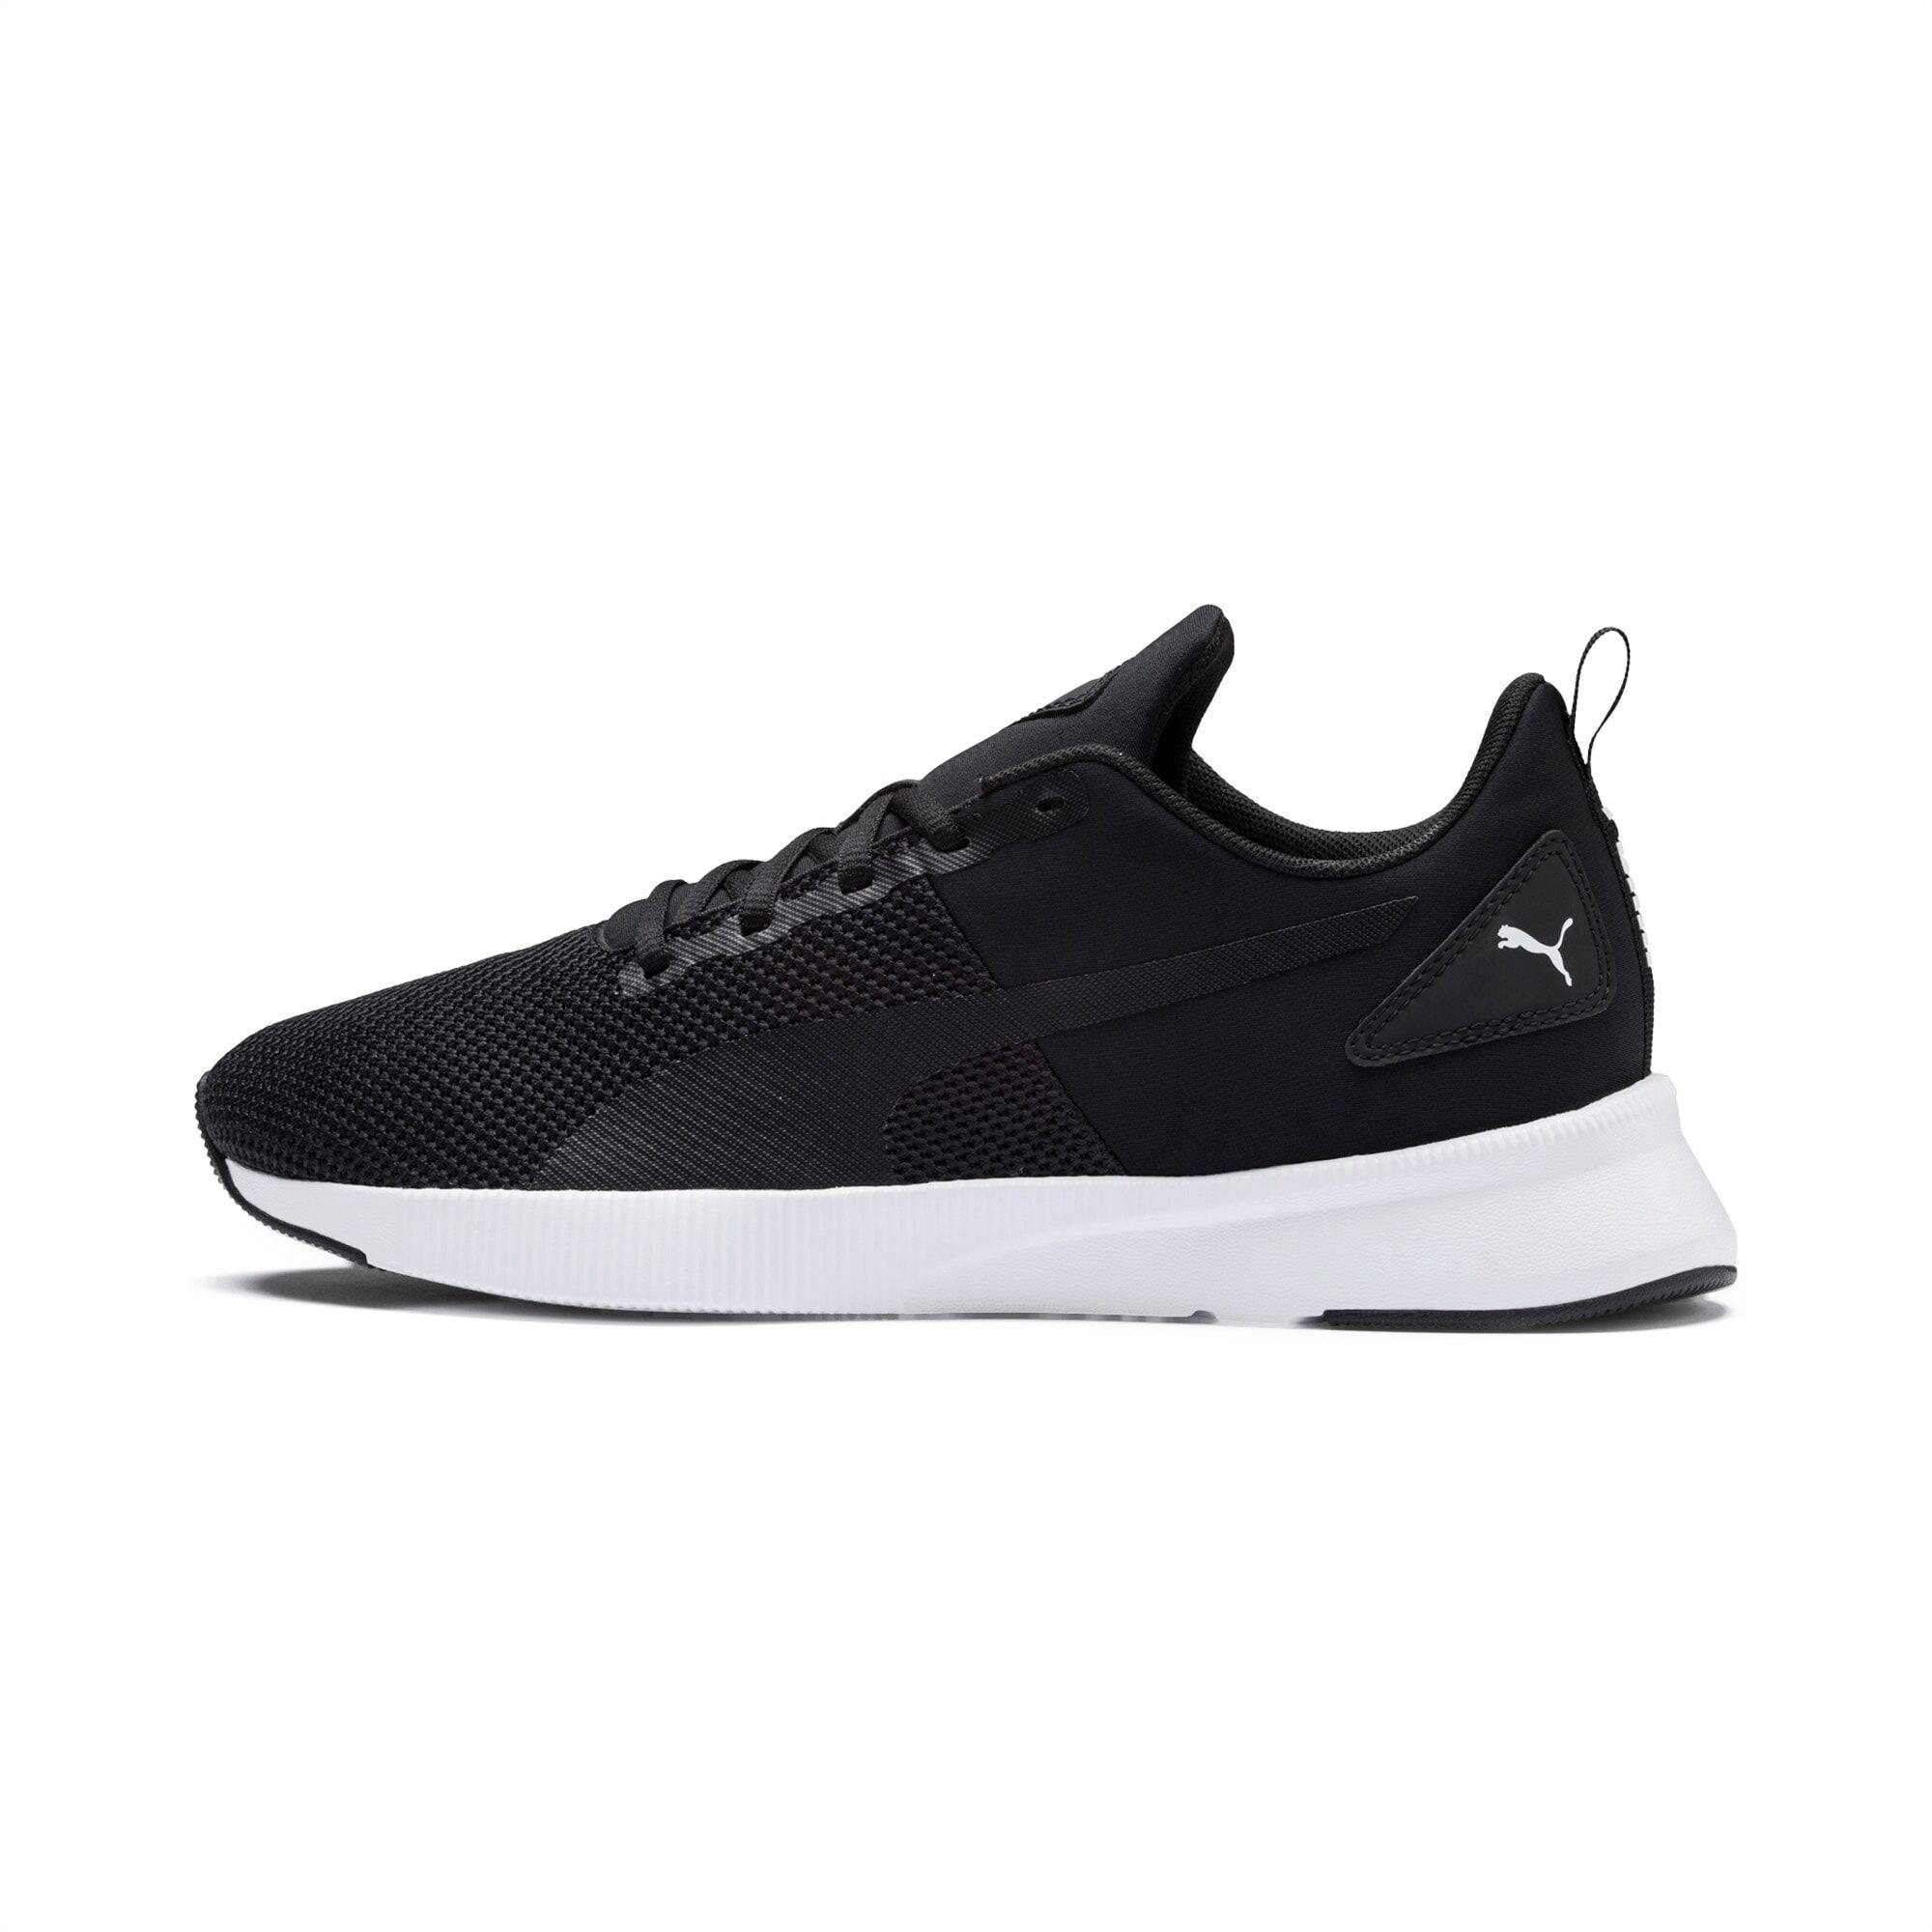 PUMA Chaussure de course Flyer Runner, Noir/Blanc, Taille 45, Chaussures